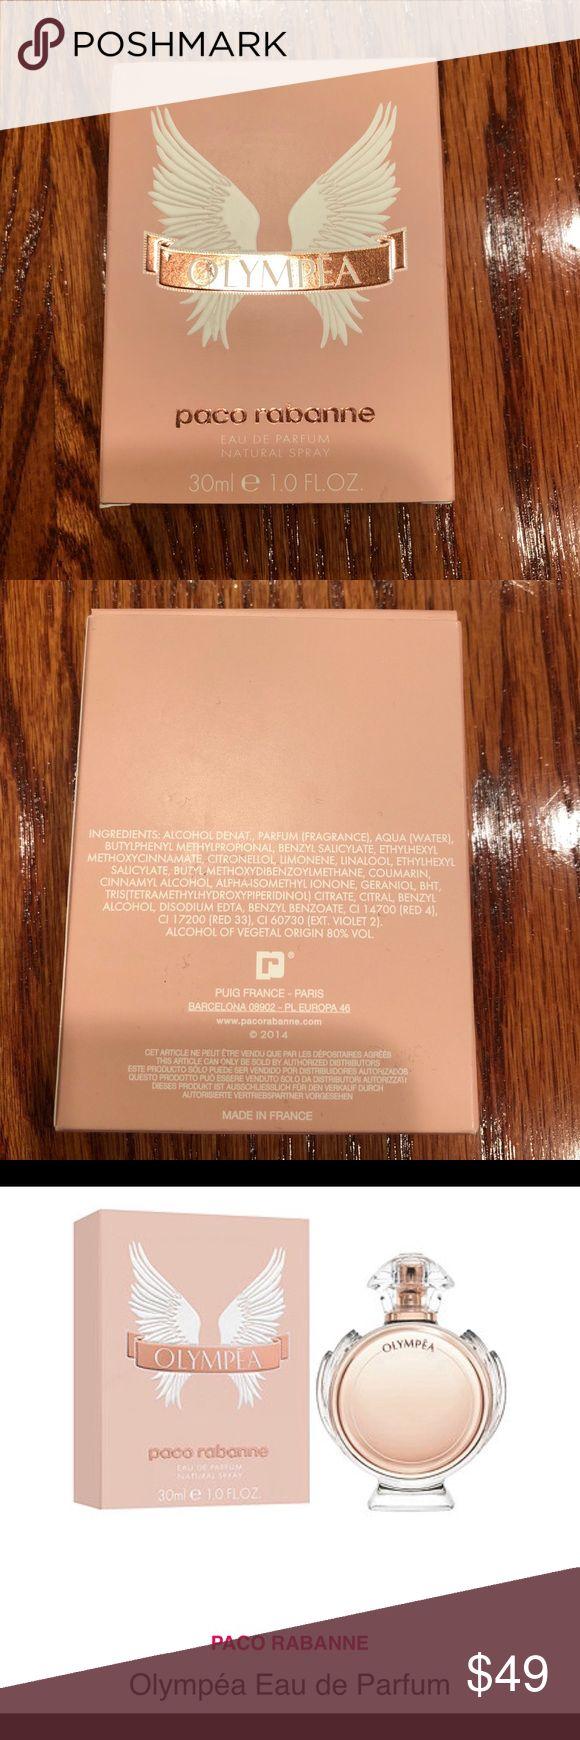 Paco Rabanne Olympea Eau De Parfum 1 fl oz Paco Rabanne Olympea Eau De Parfum 1 fl oz.  New (not sealed in plastic) Paco Rabanne Makeup